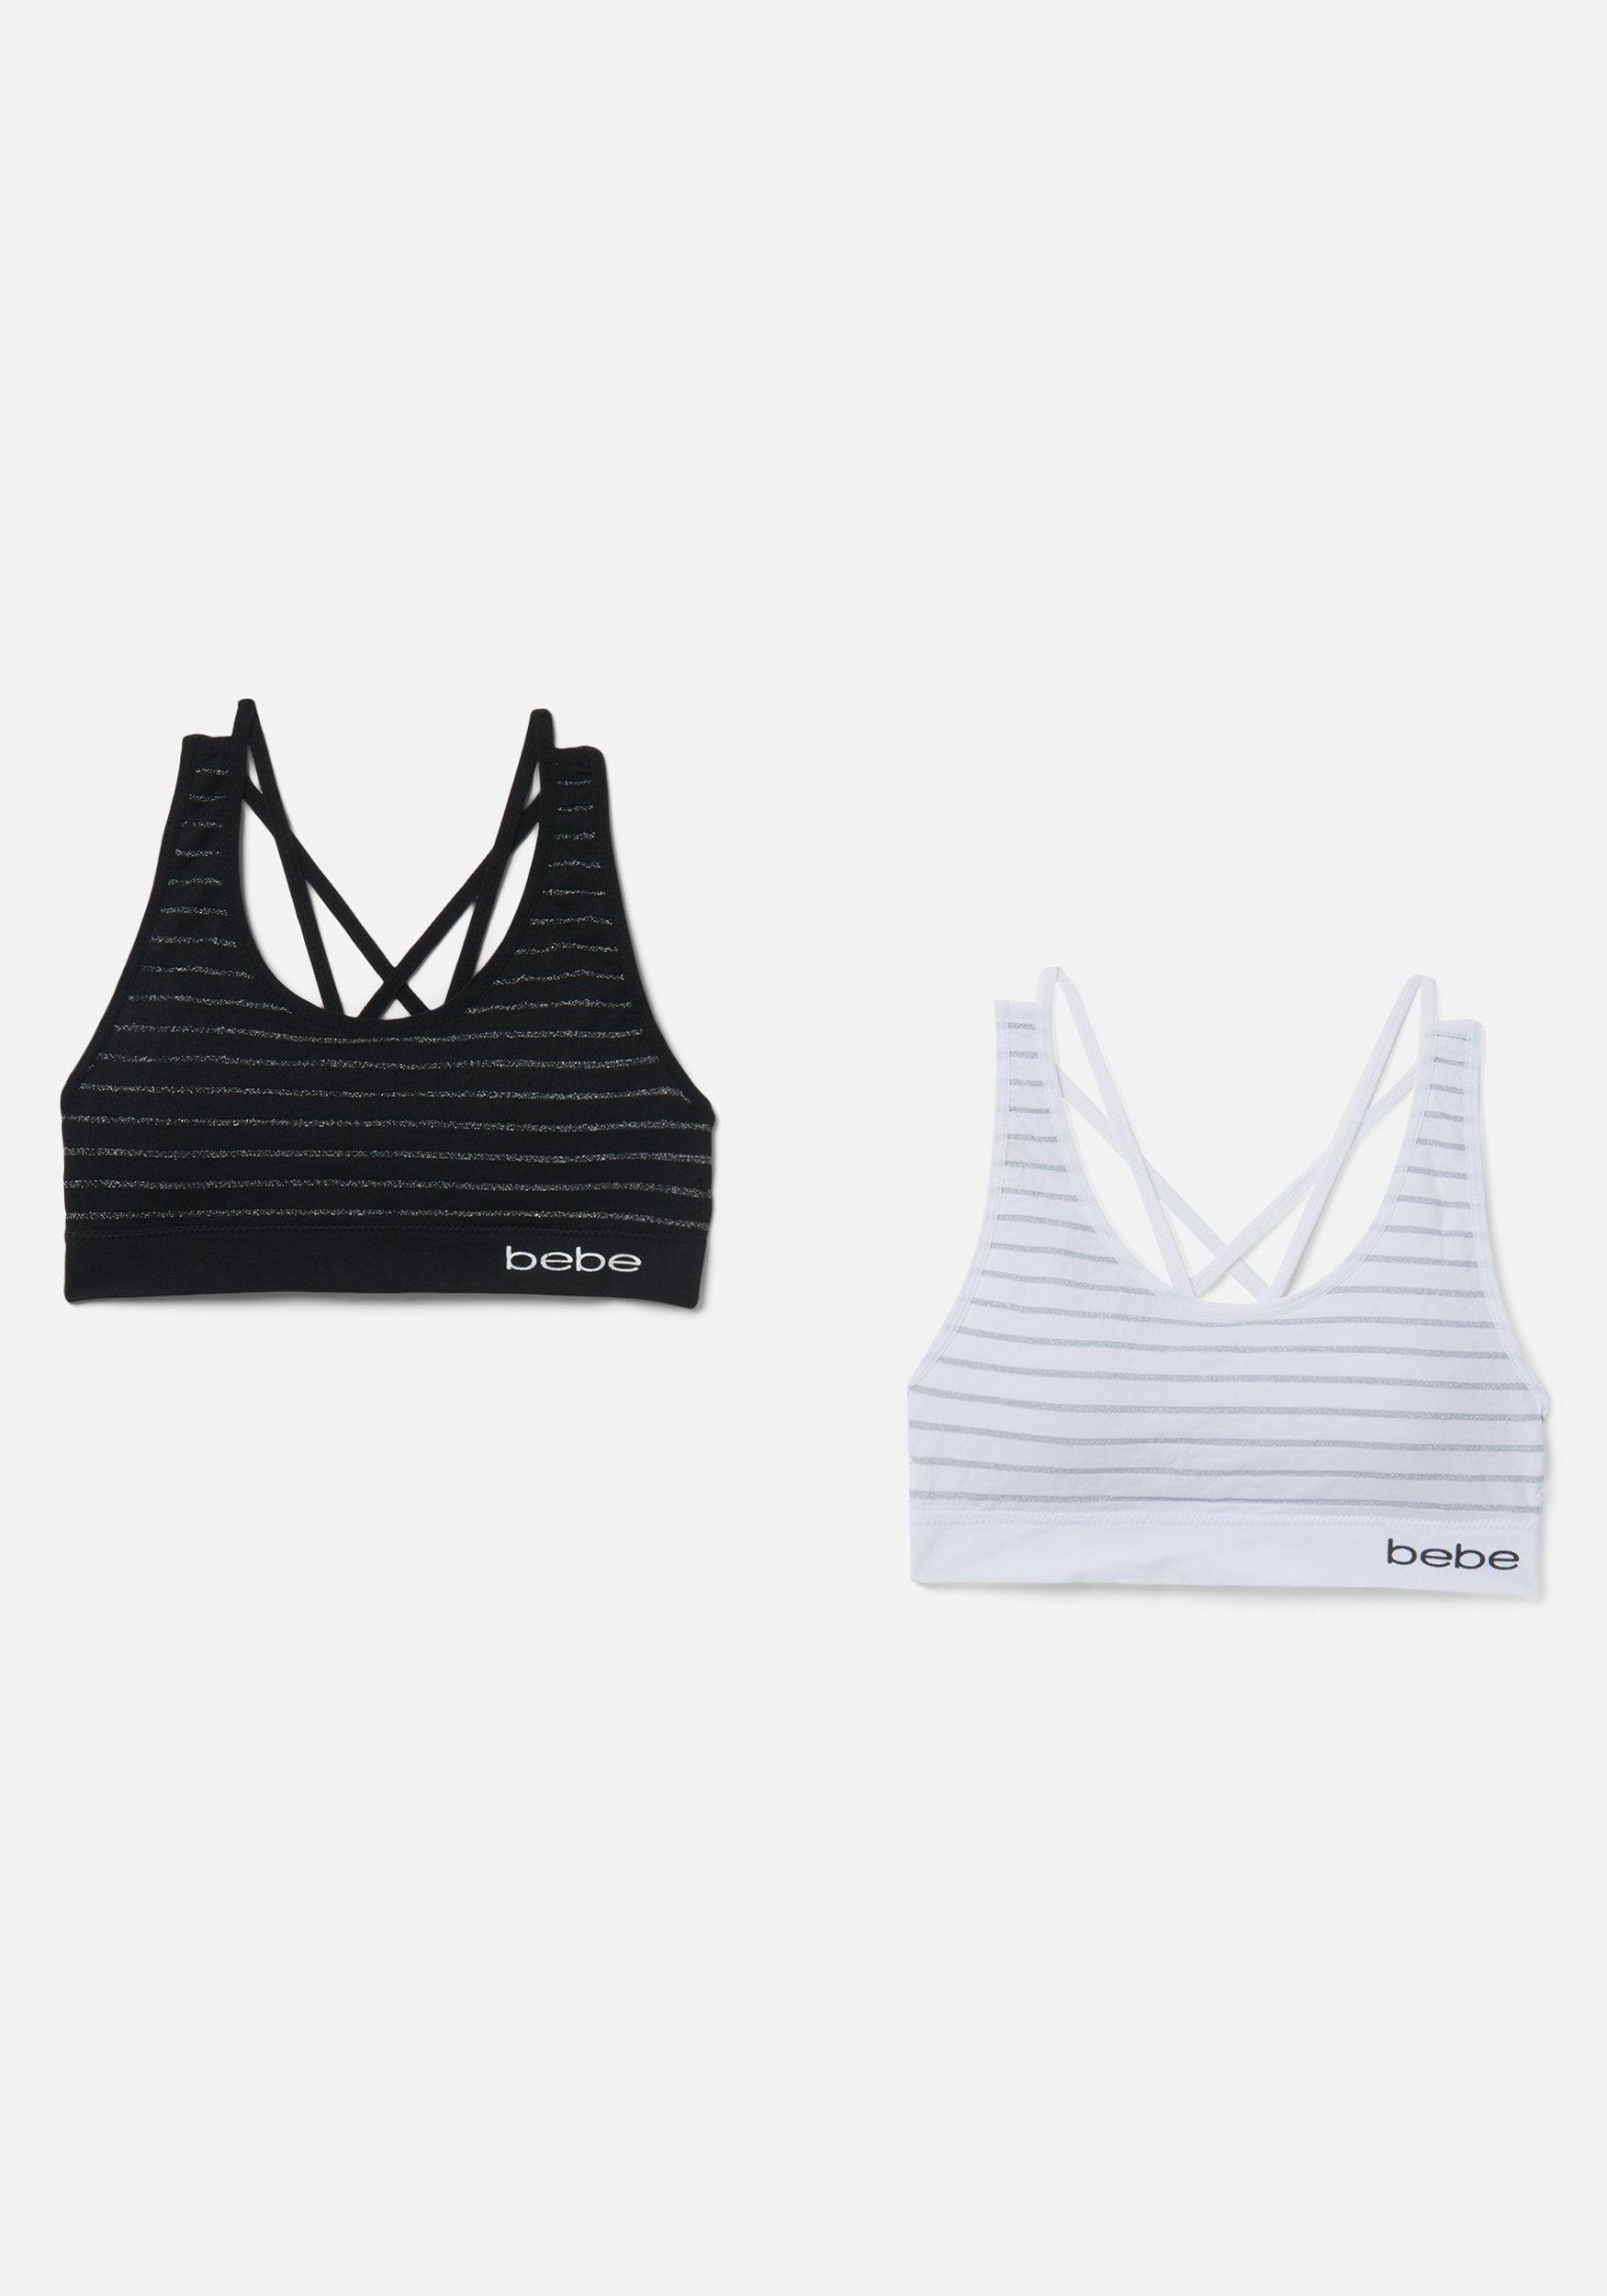 Bebe Women's 2 Pack Stripe Sports Bra, Size Large in Whiteout Spandex/Nylon